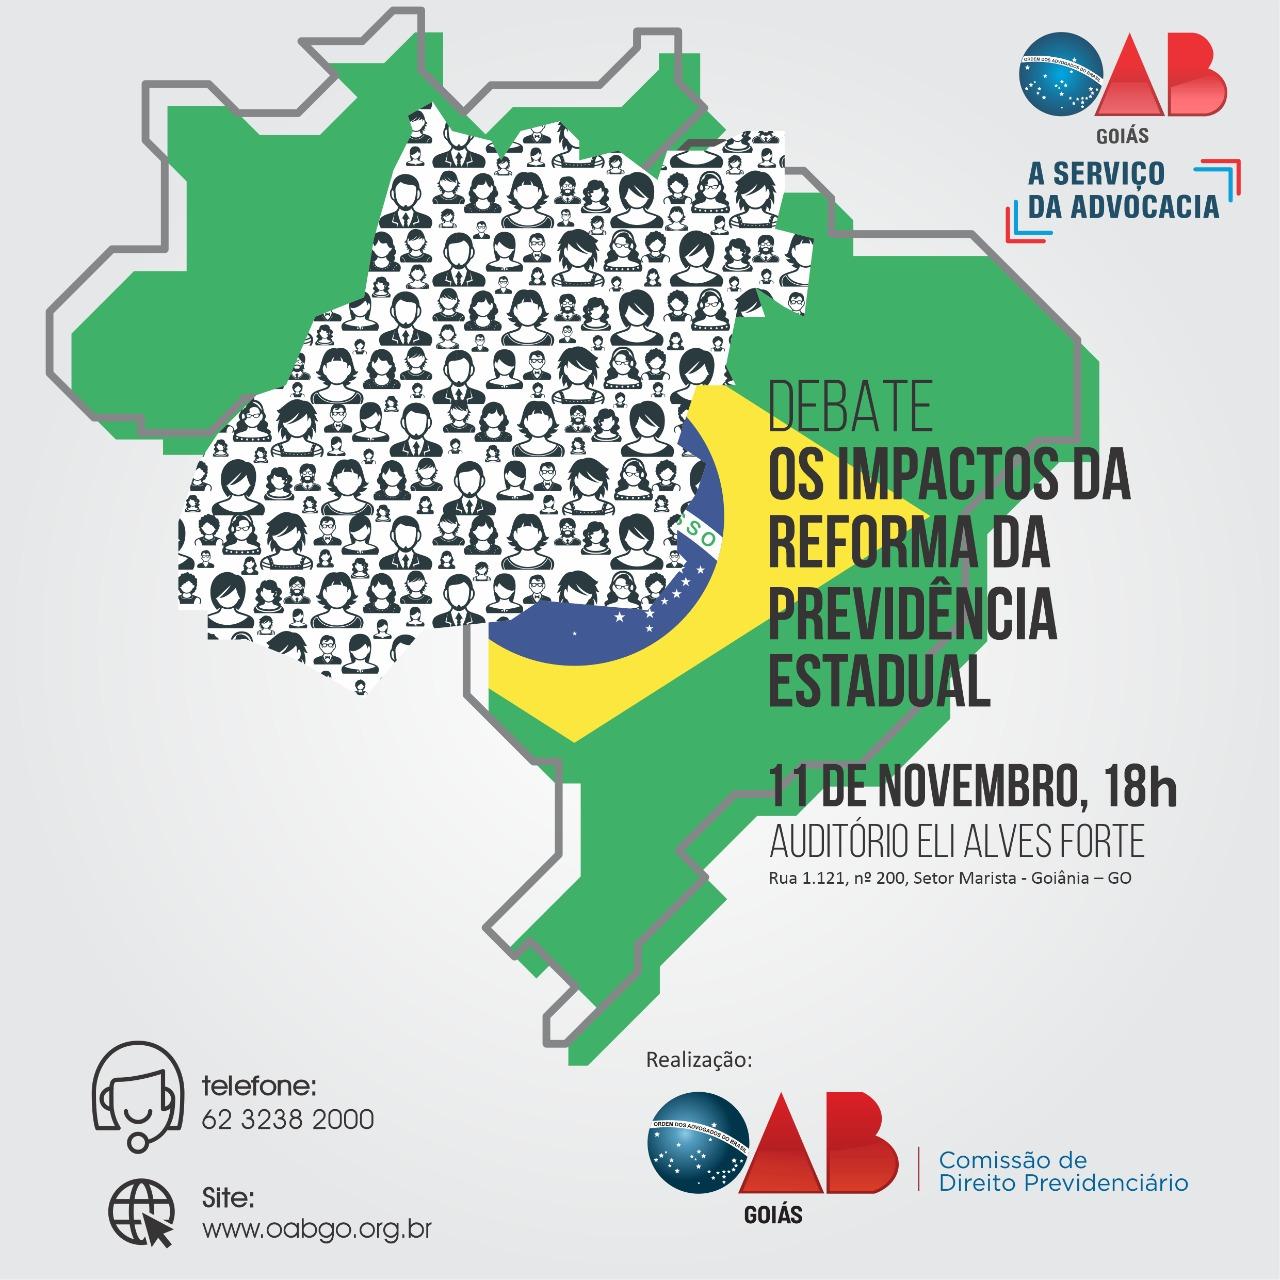 11.11 - Debate - Os Impactos da Reforma da Previdência Estadual